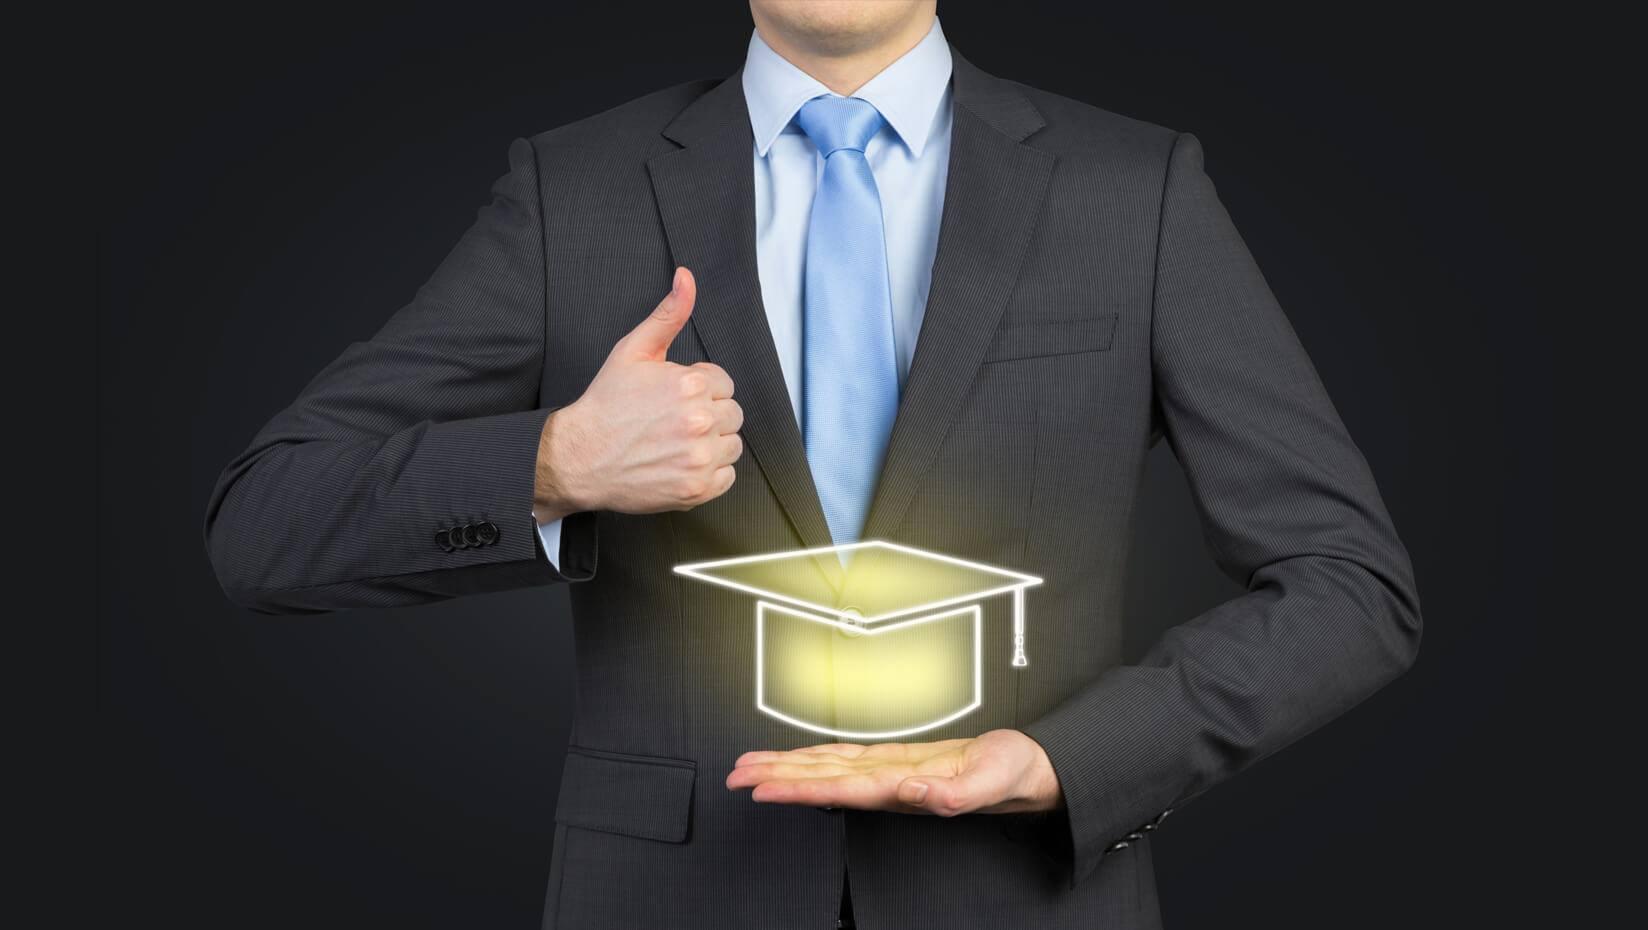 The Donts For Popular VMware 3V0-42.20 Exam Preparation